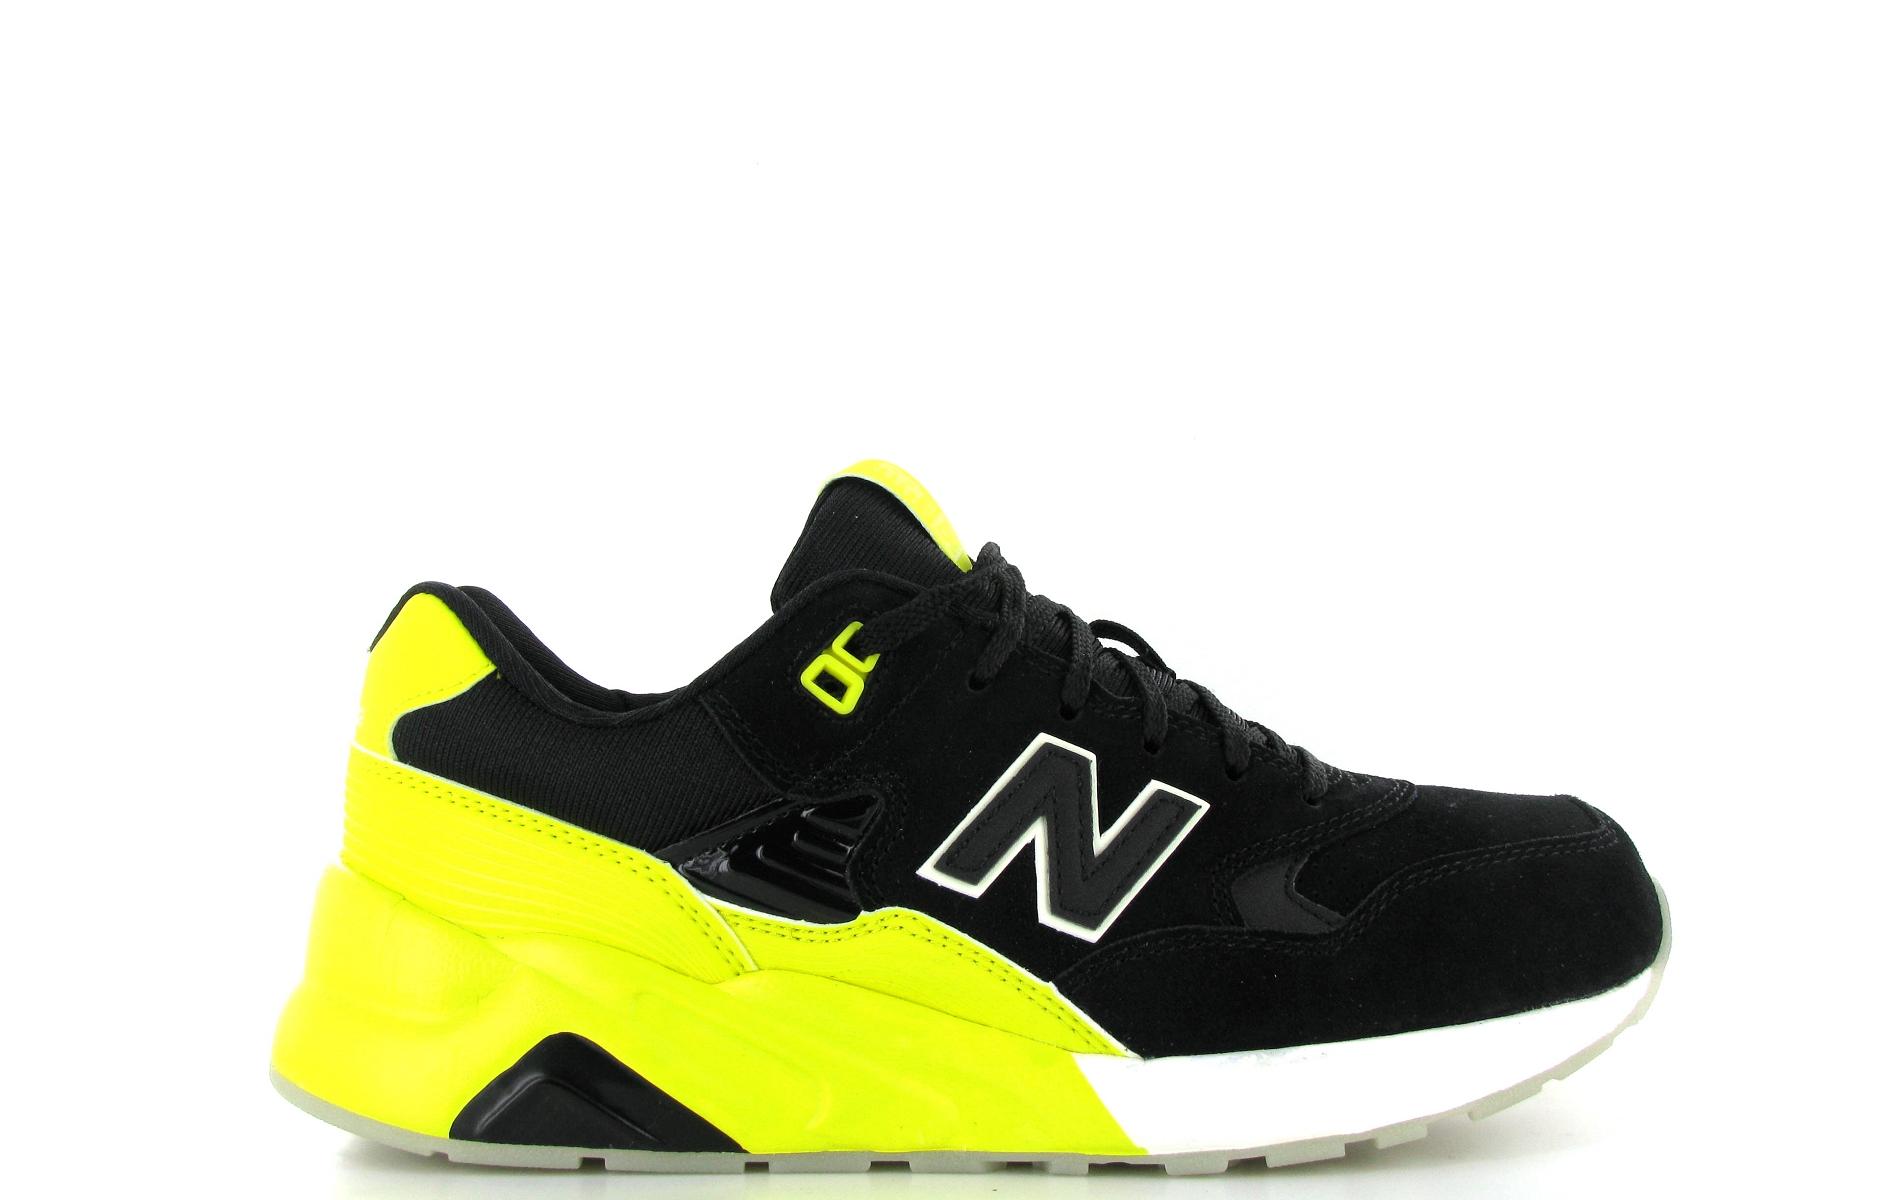 New balance kl 580 jaune